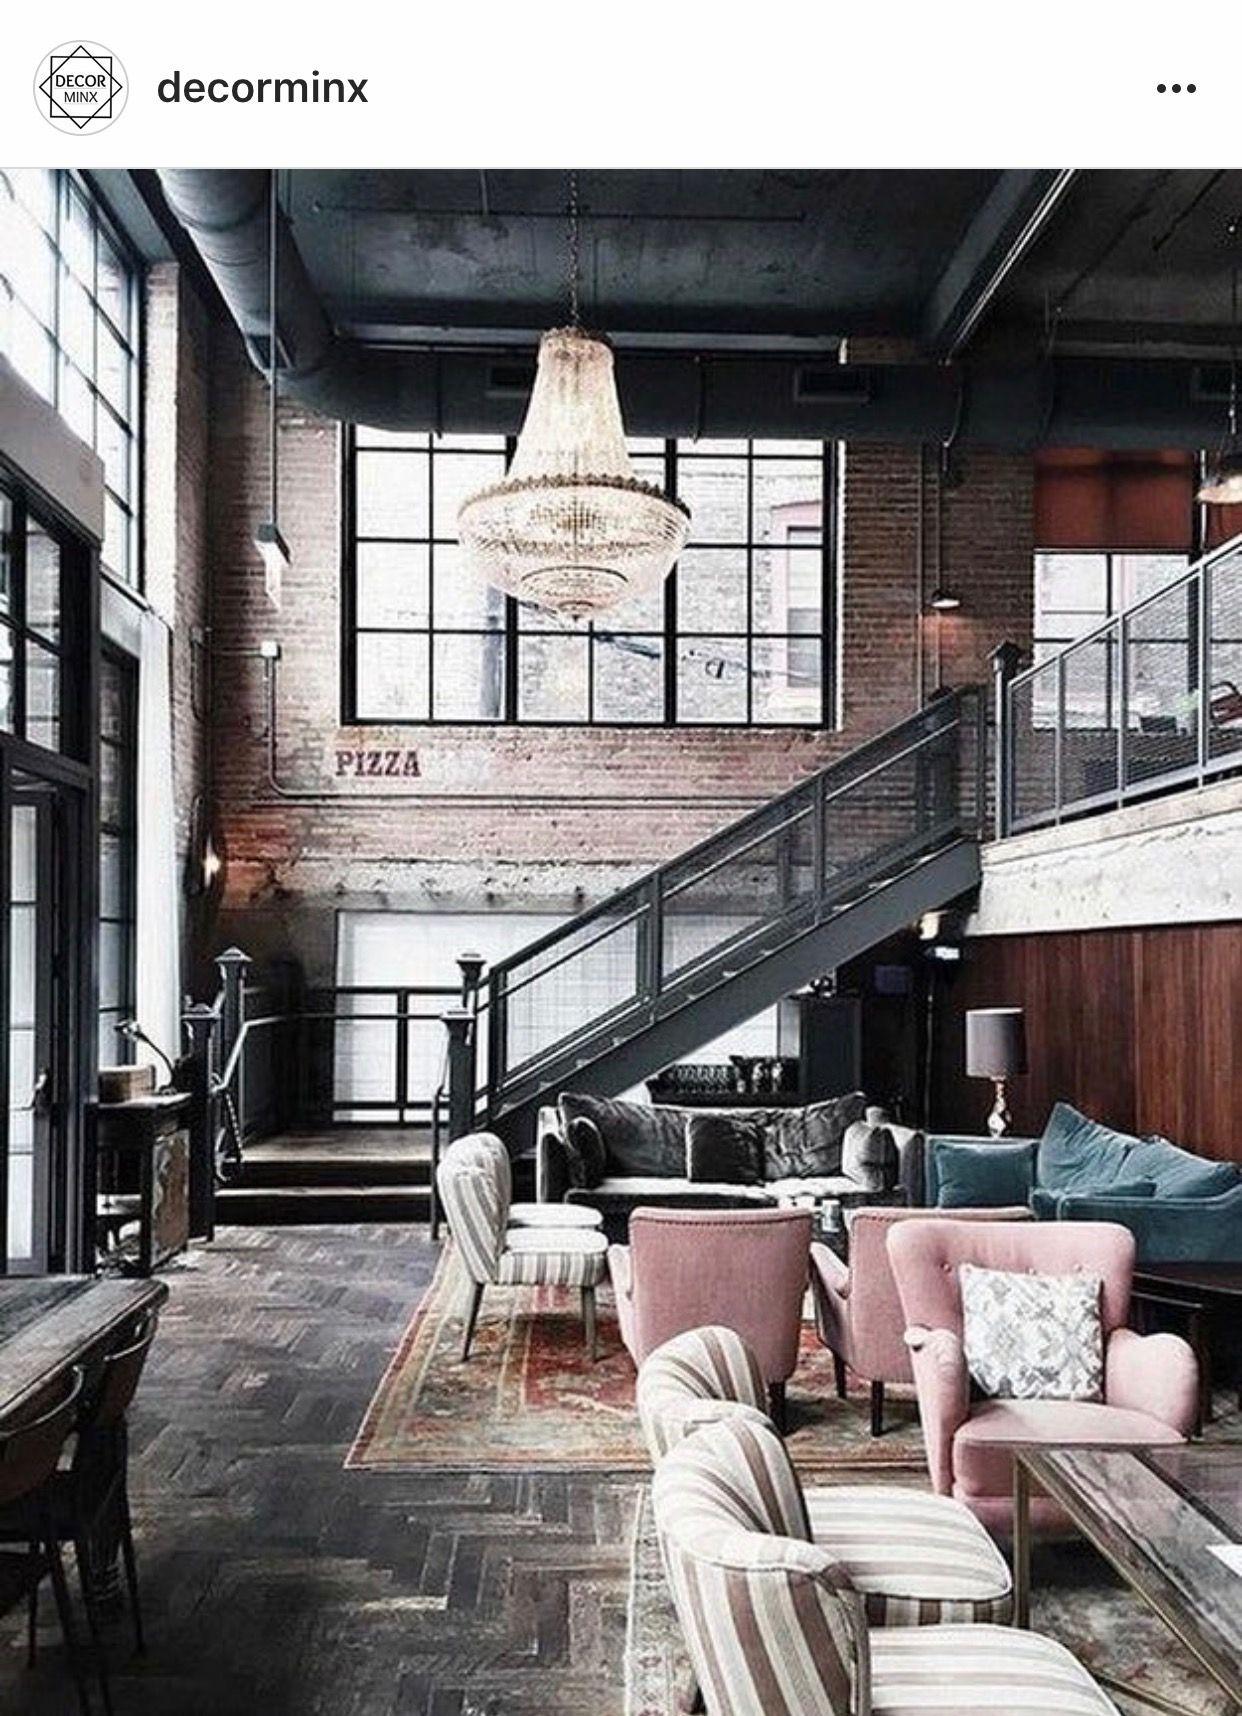 Pin by Kim on Interiors Lofts